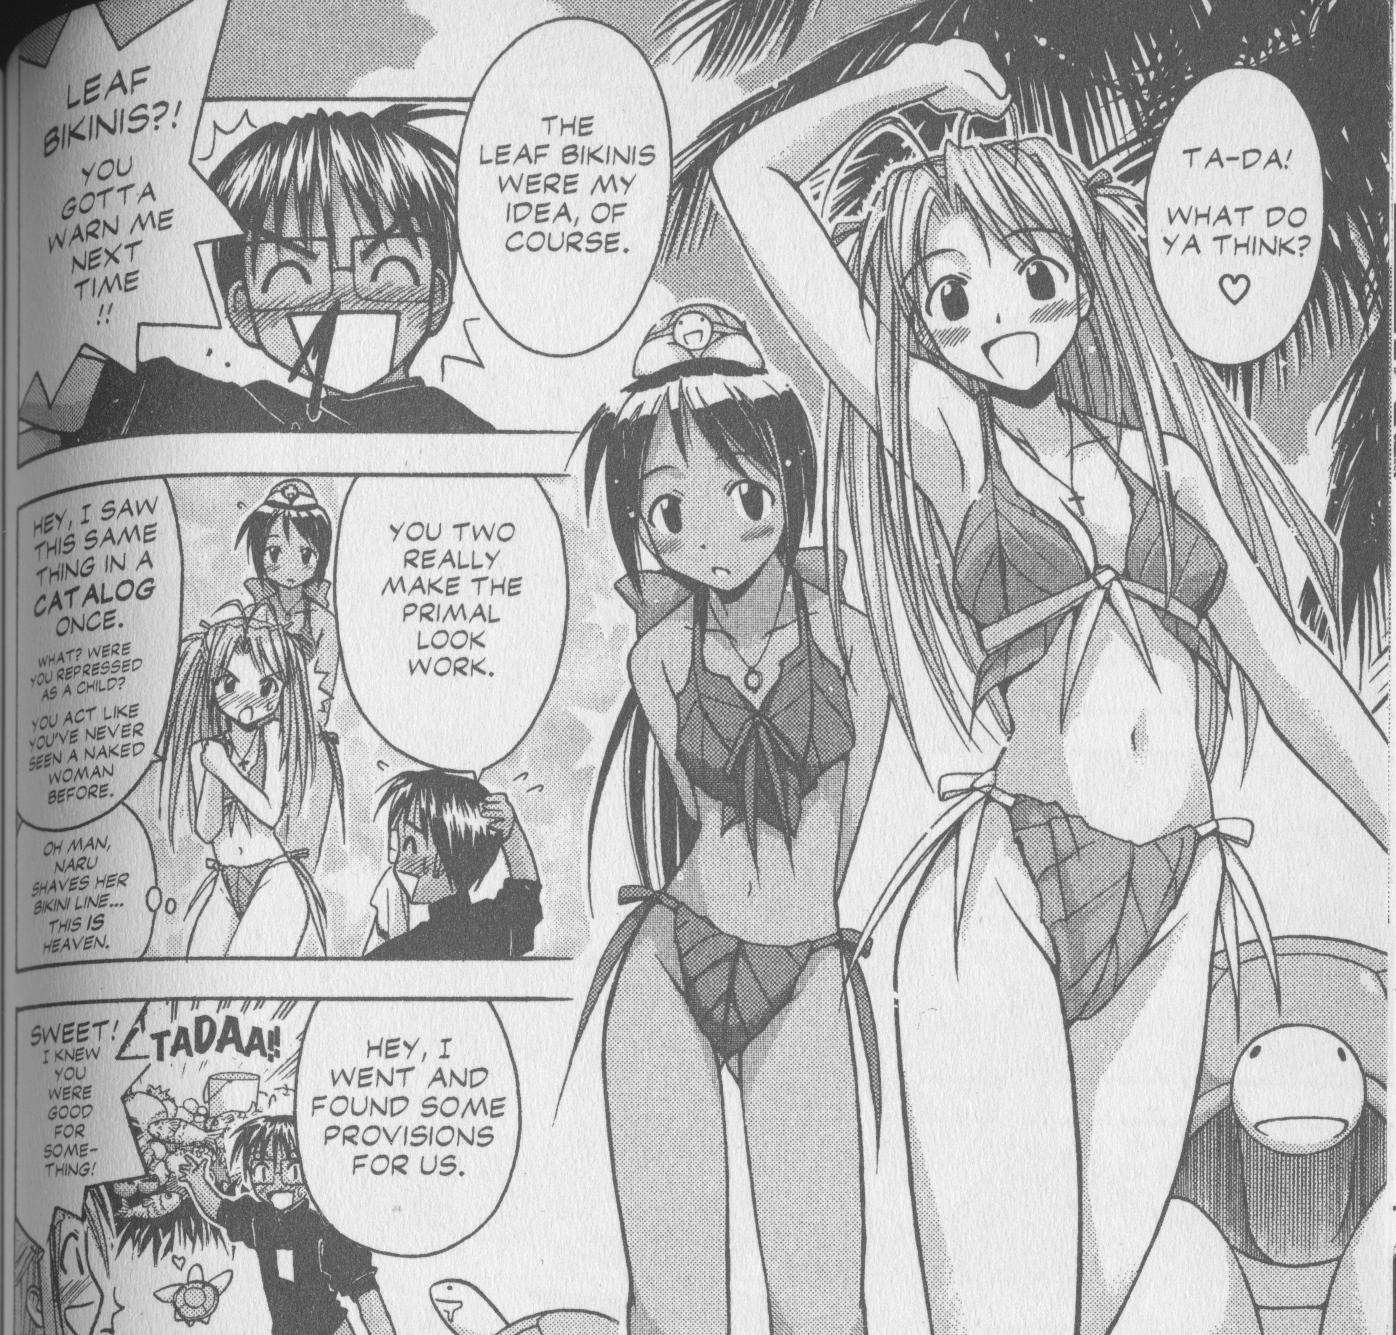 Leaf bikini love hina dating